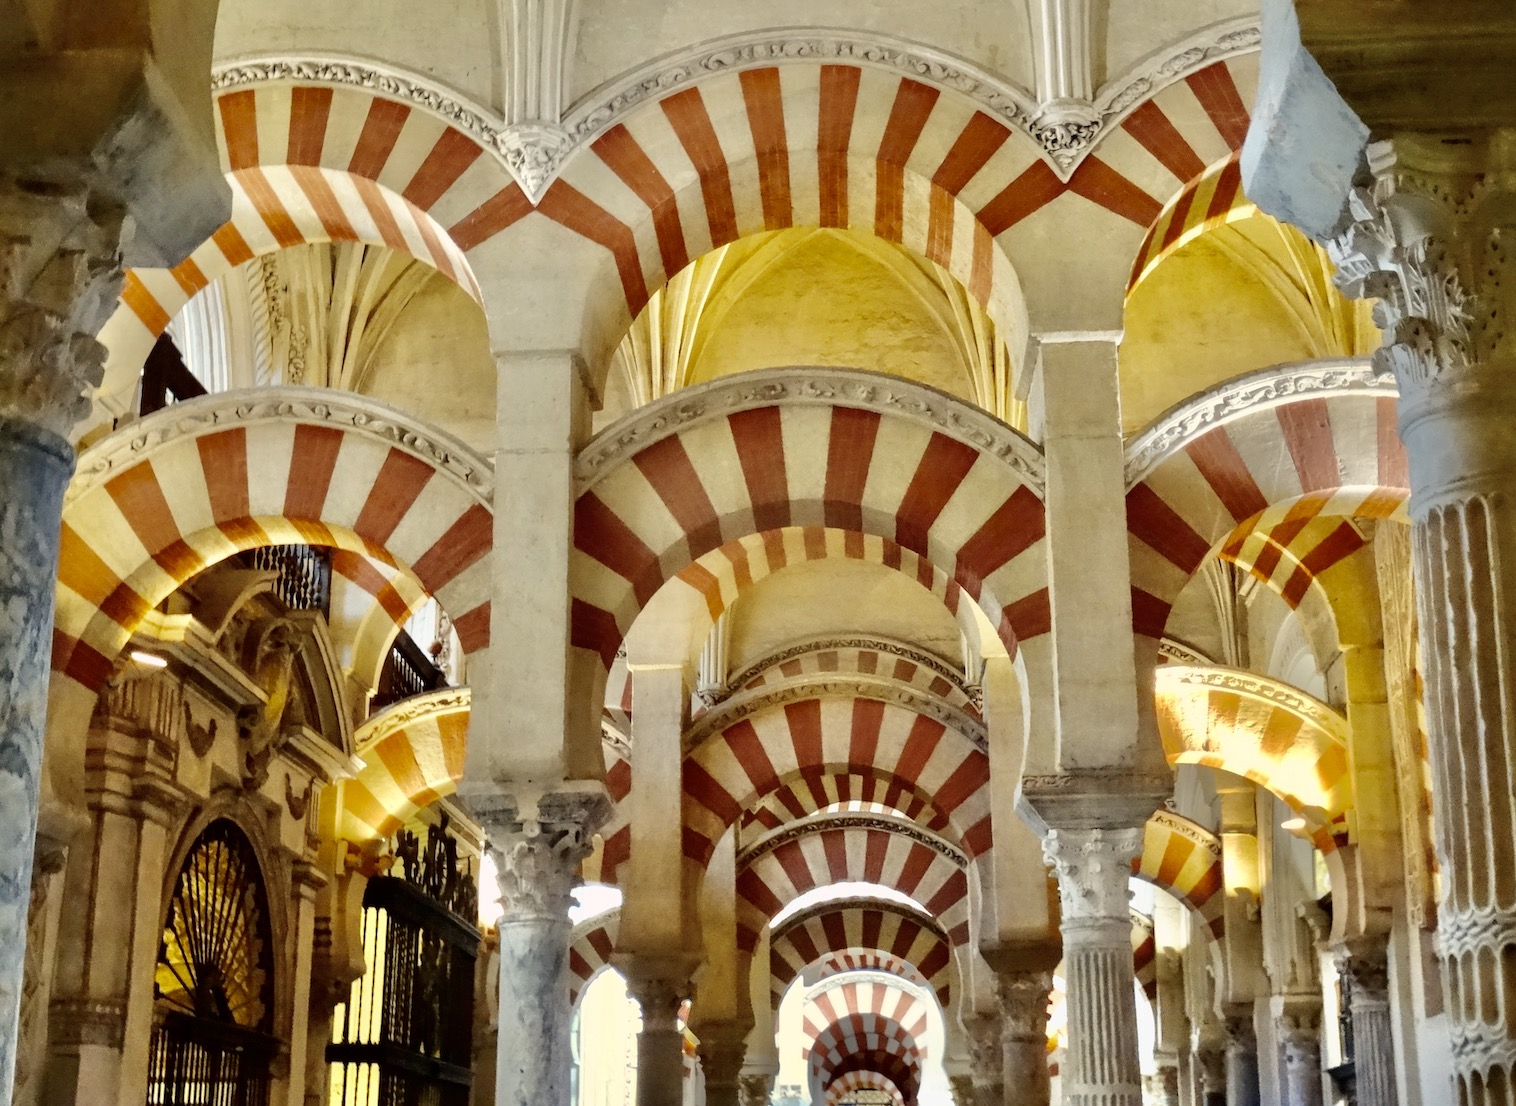 The Mezquita Arches Cordoba Spain.